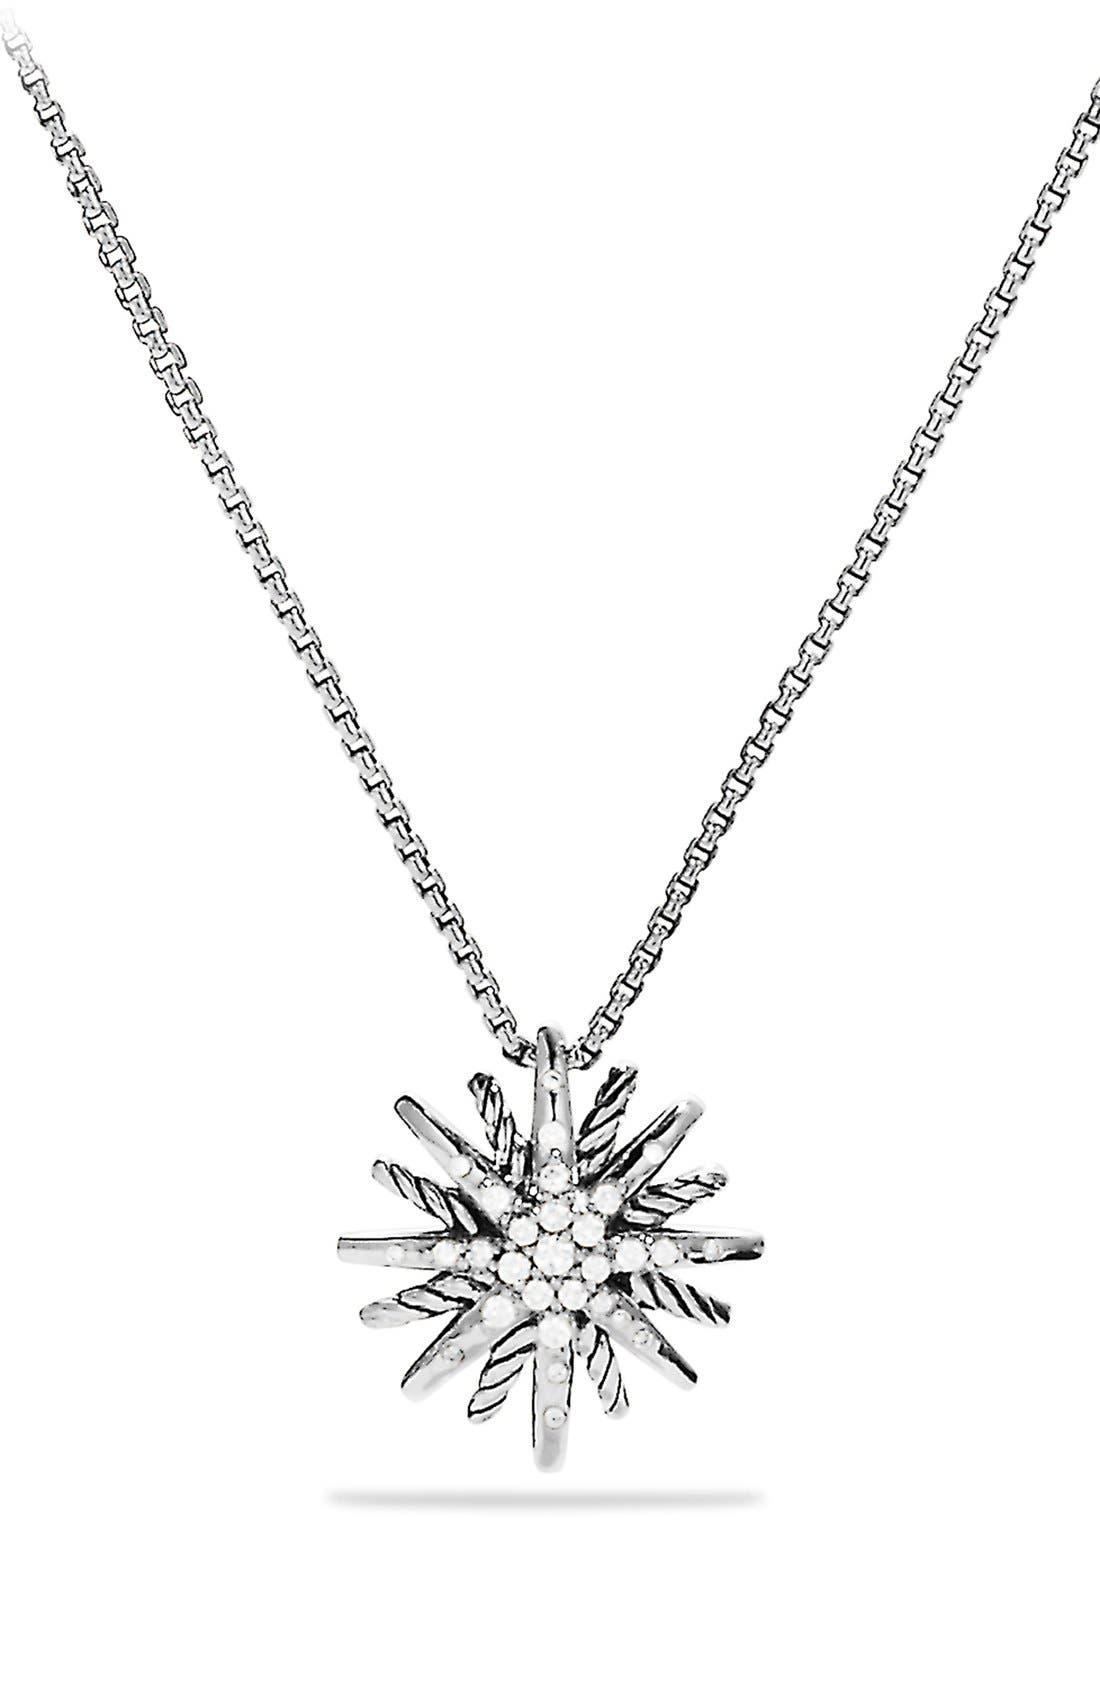 'Starburst' Small Pendant with Diamonds on Chain,                             Main thumbnail 1, color,                             DIAMOND